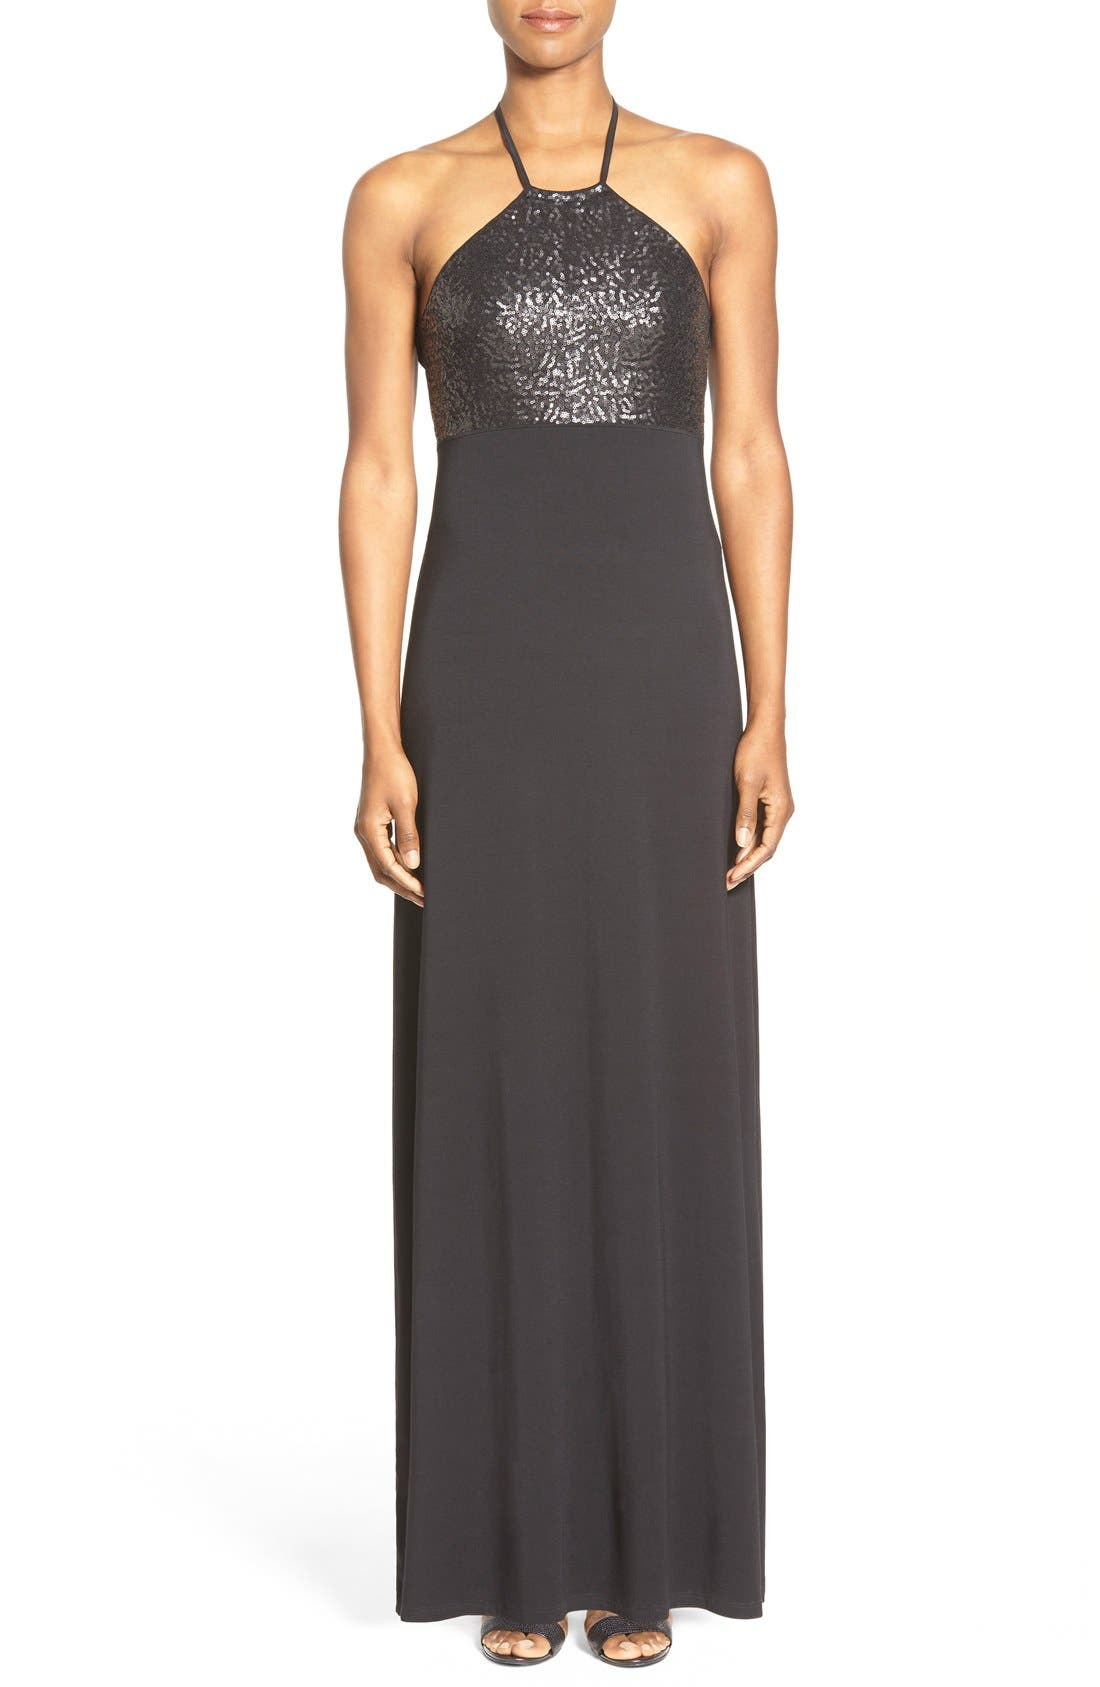 Alternate Image 1 Selected - Tommy Bahama Sequin Bodice Halter Maxi Dress